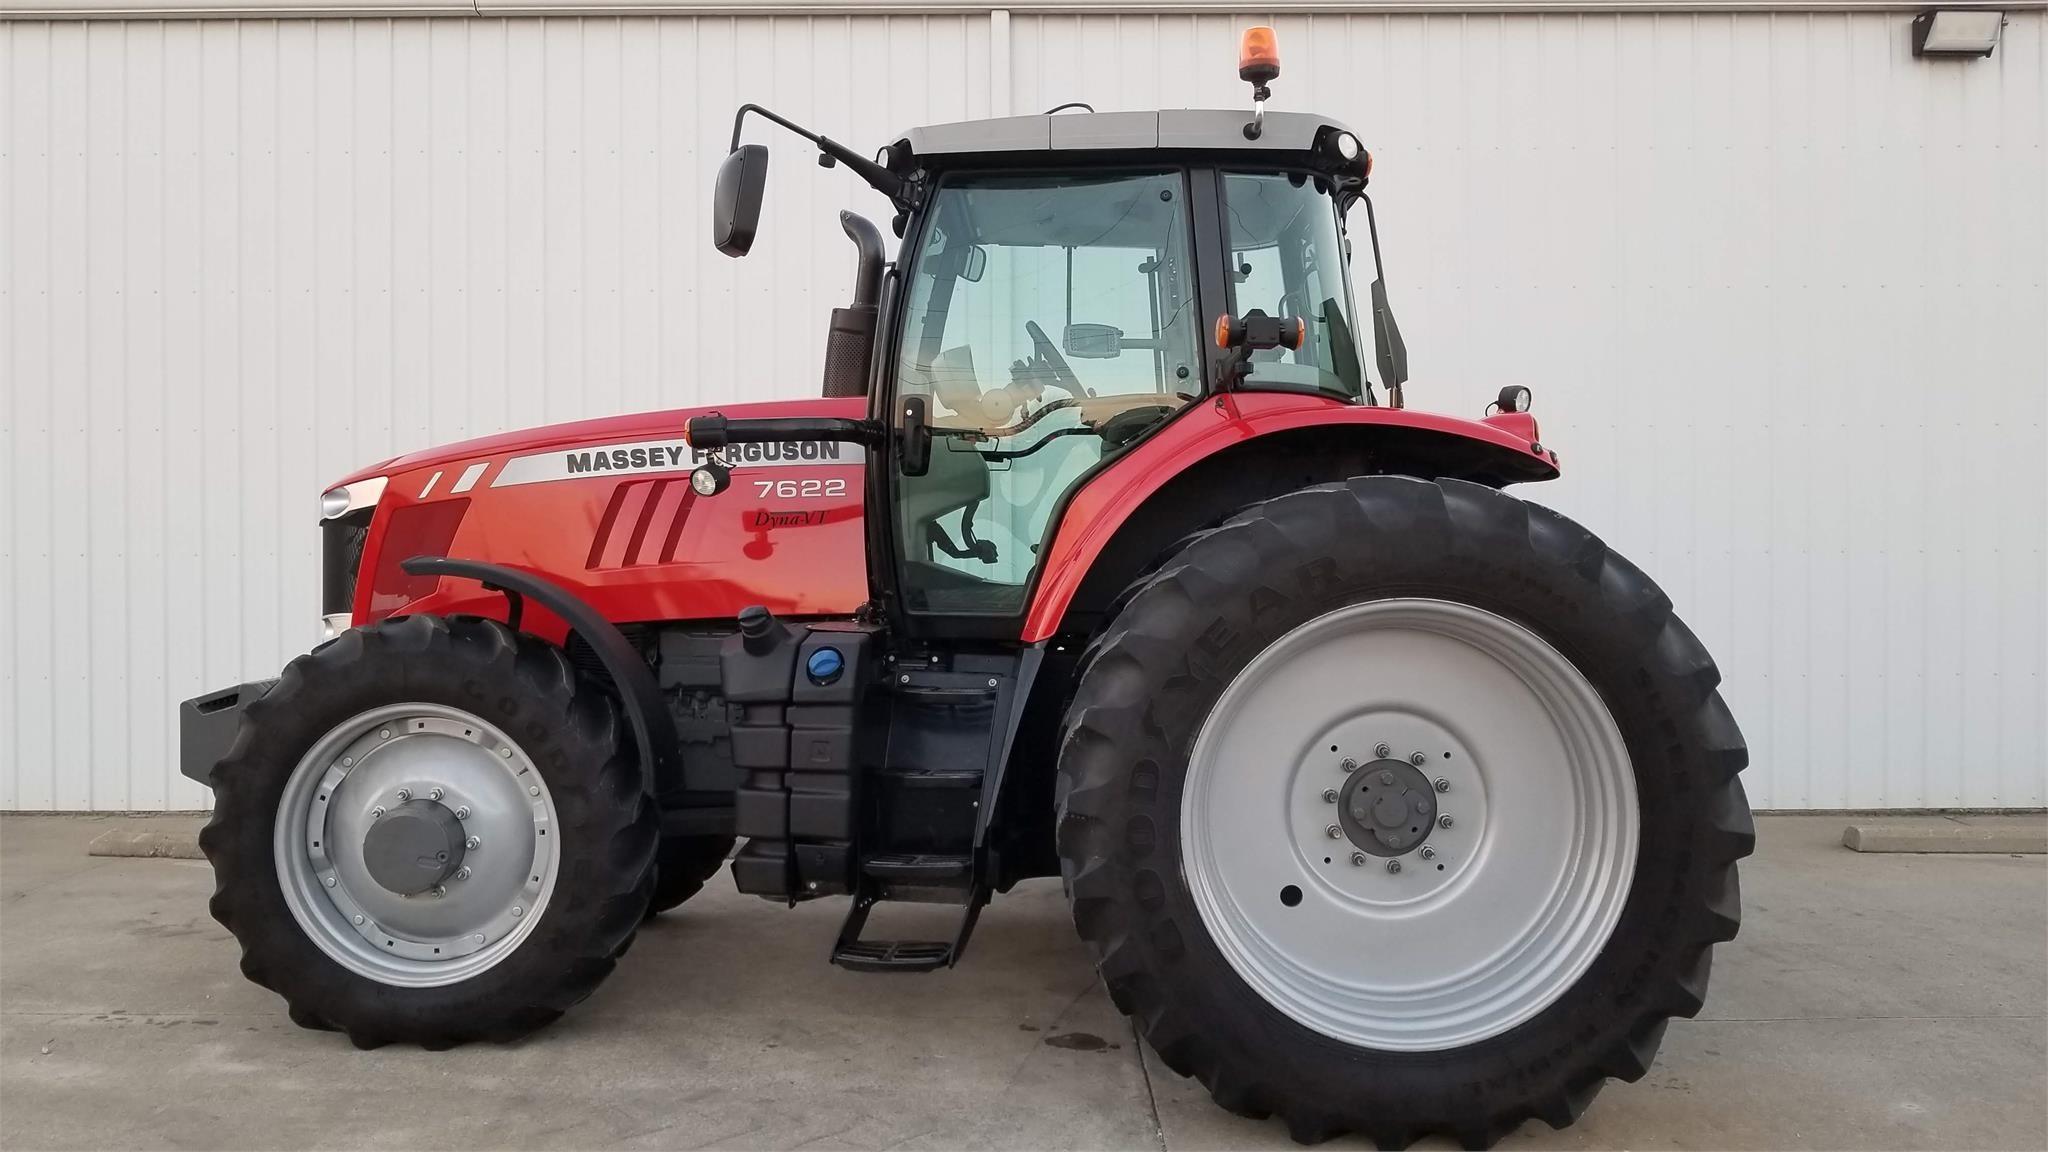 2014 Massey Ferguson 7622 Tractor